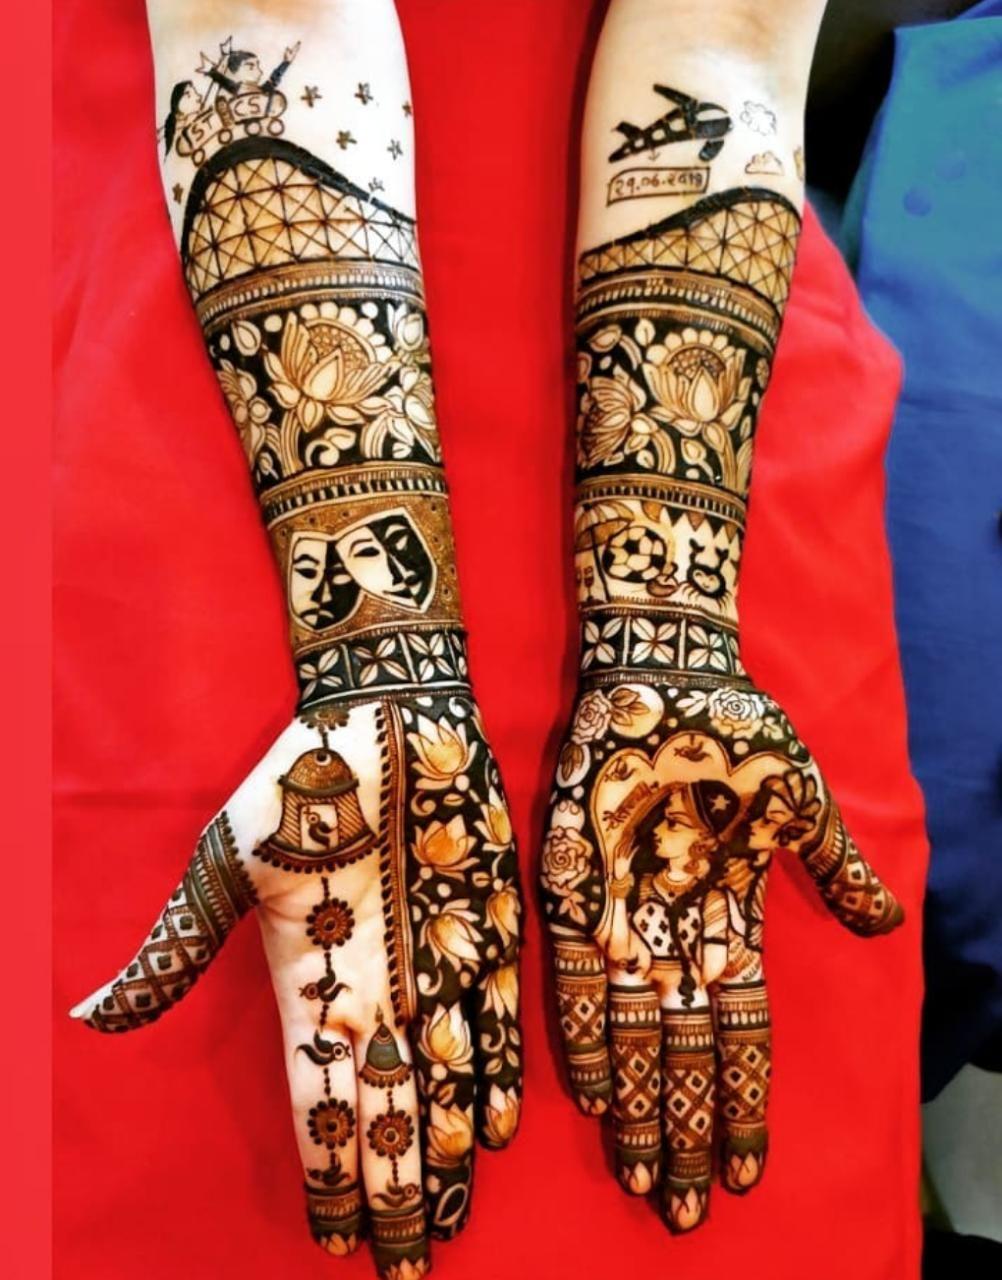 Mehendi design ideas for brides # Portrait mehendi ideas #Bridal heena  inspiration # Tren… | Bridal mehndi designs, Bridal mehendi designs, Full  hand mehndi designs